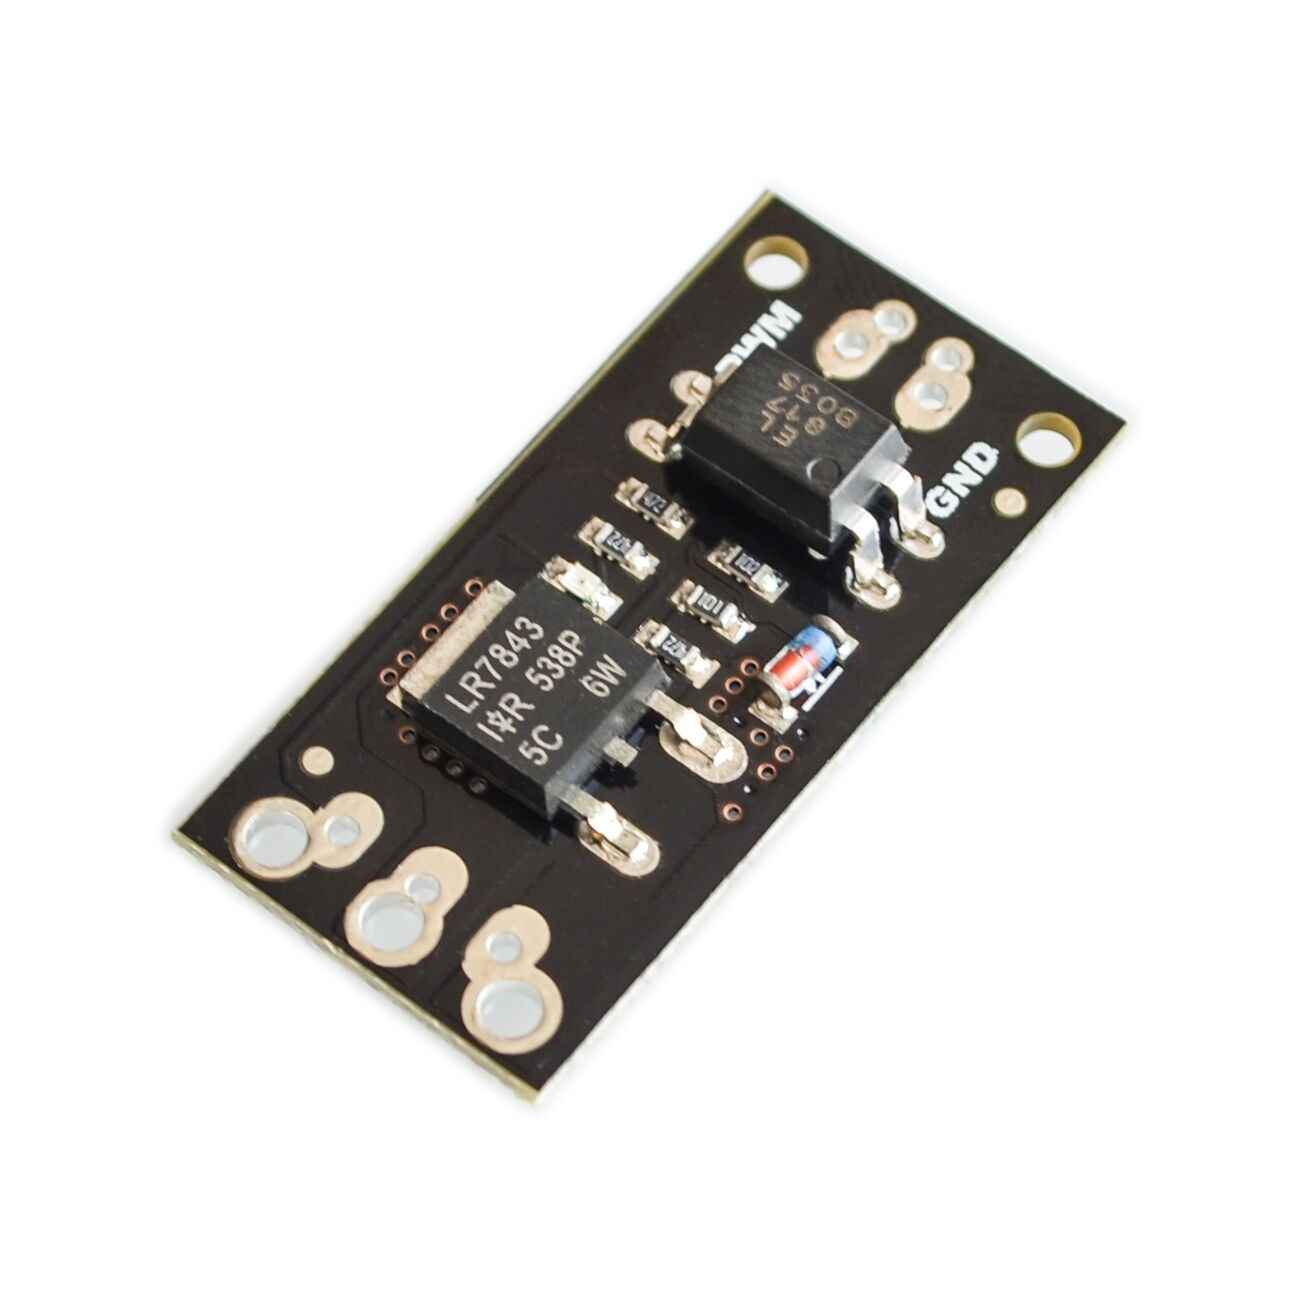 LR7843 D4184 FR120N mosモジュールmosfet制御モジュール電界効果モジュール